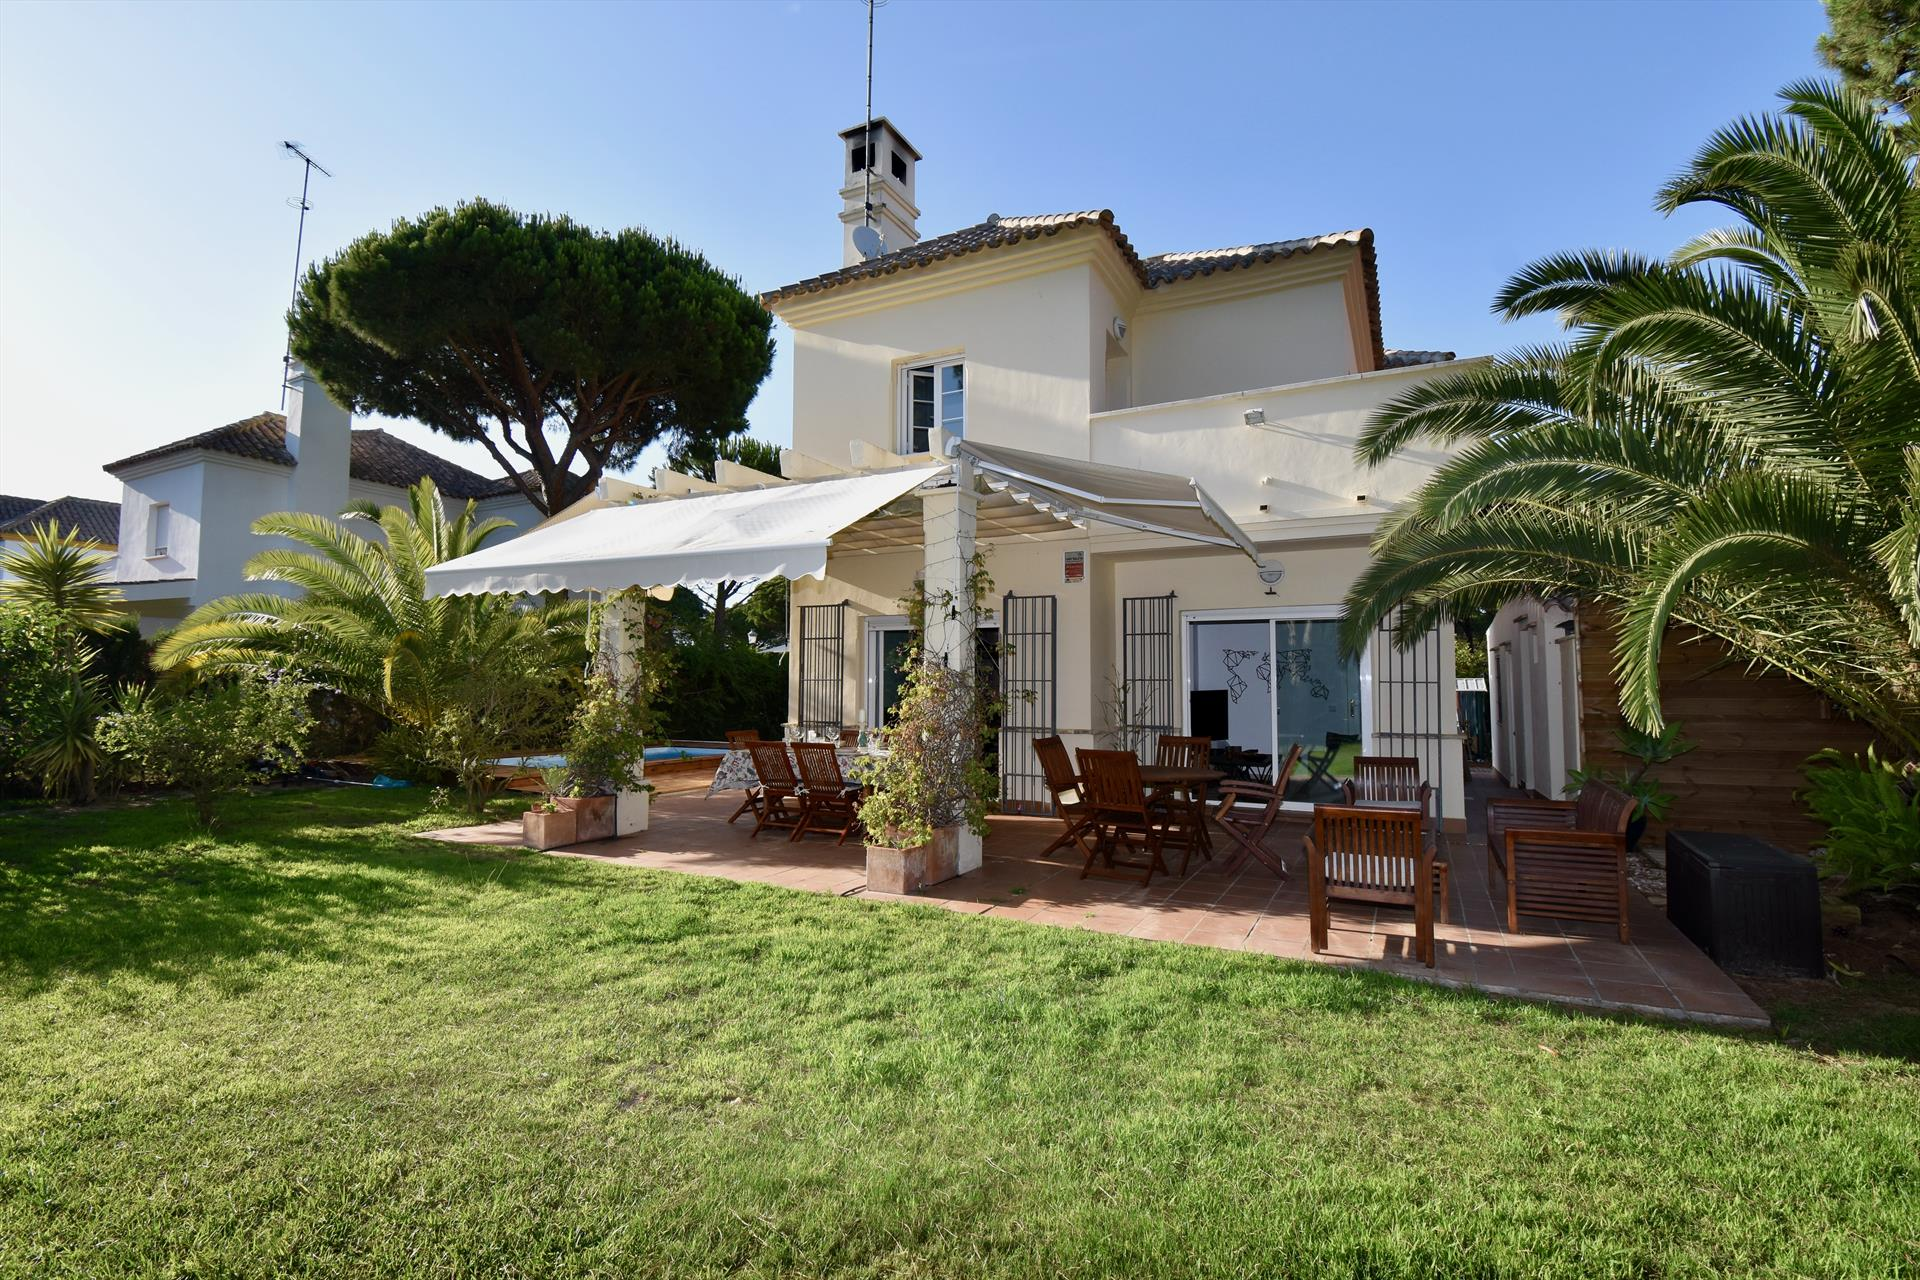 Martiniano,Modern and comfortable villa in Chiclana de la Frontera, Andalusia, Spain  with private pool for 6 persons.....